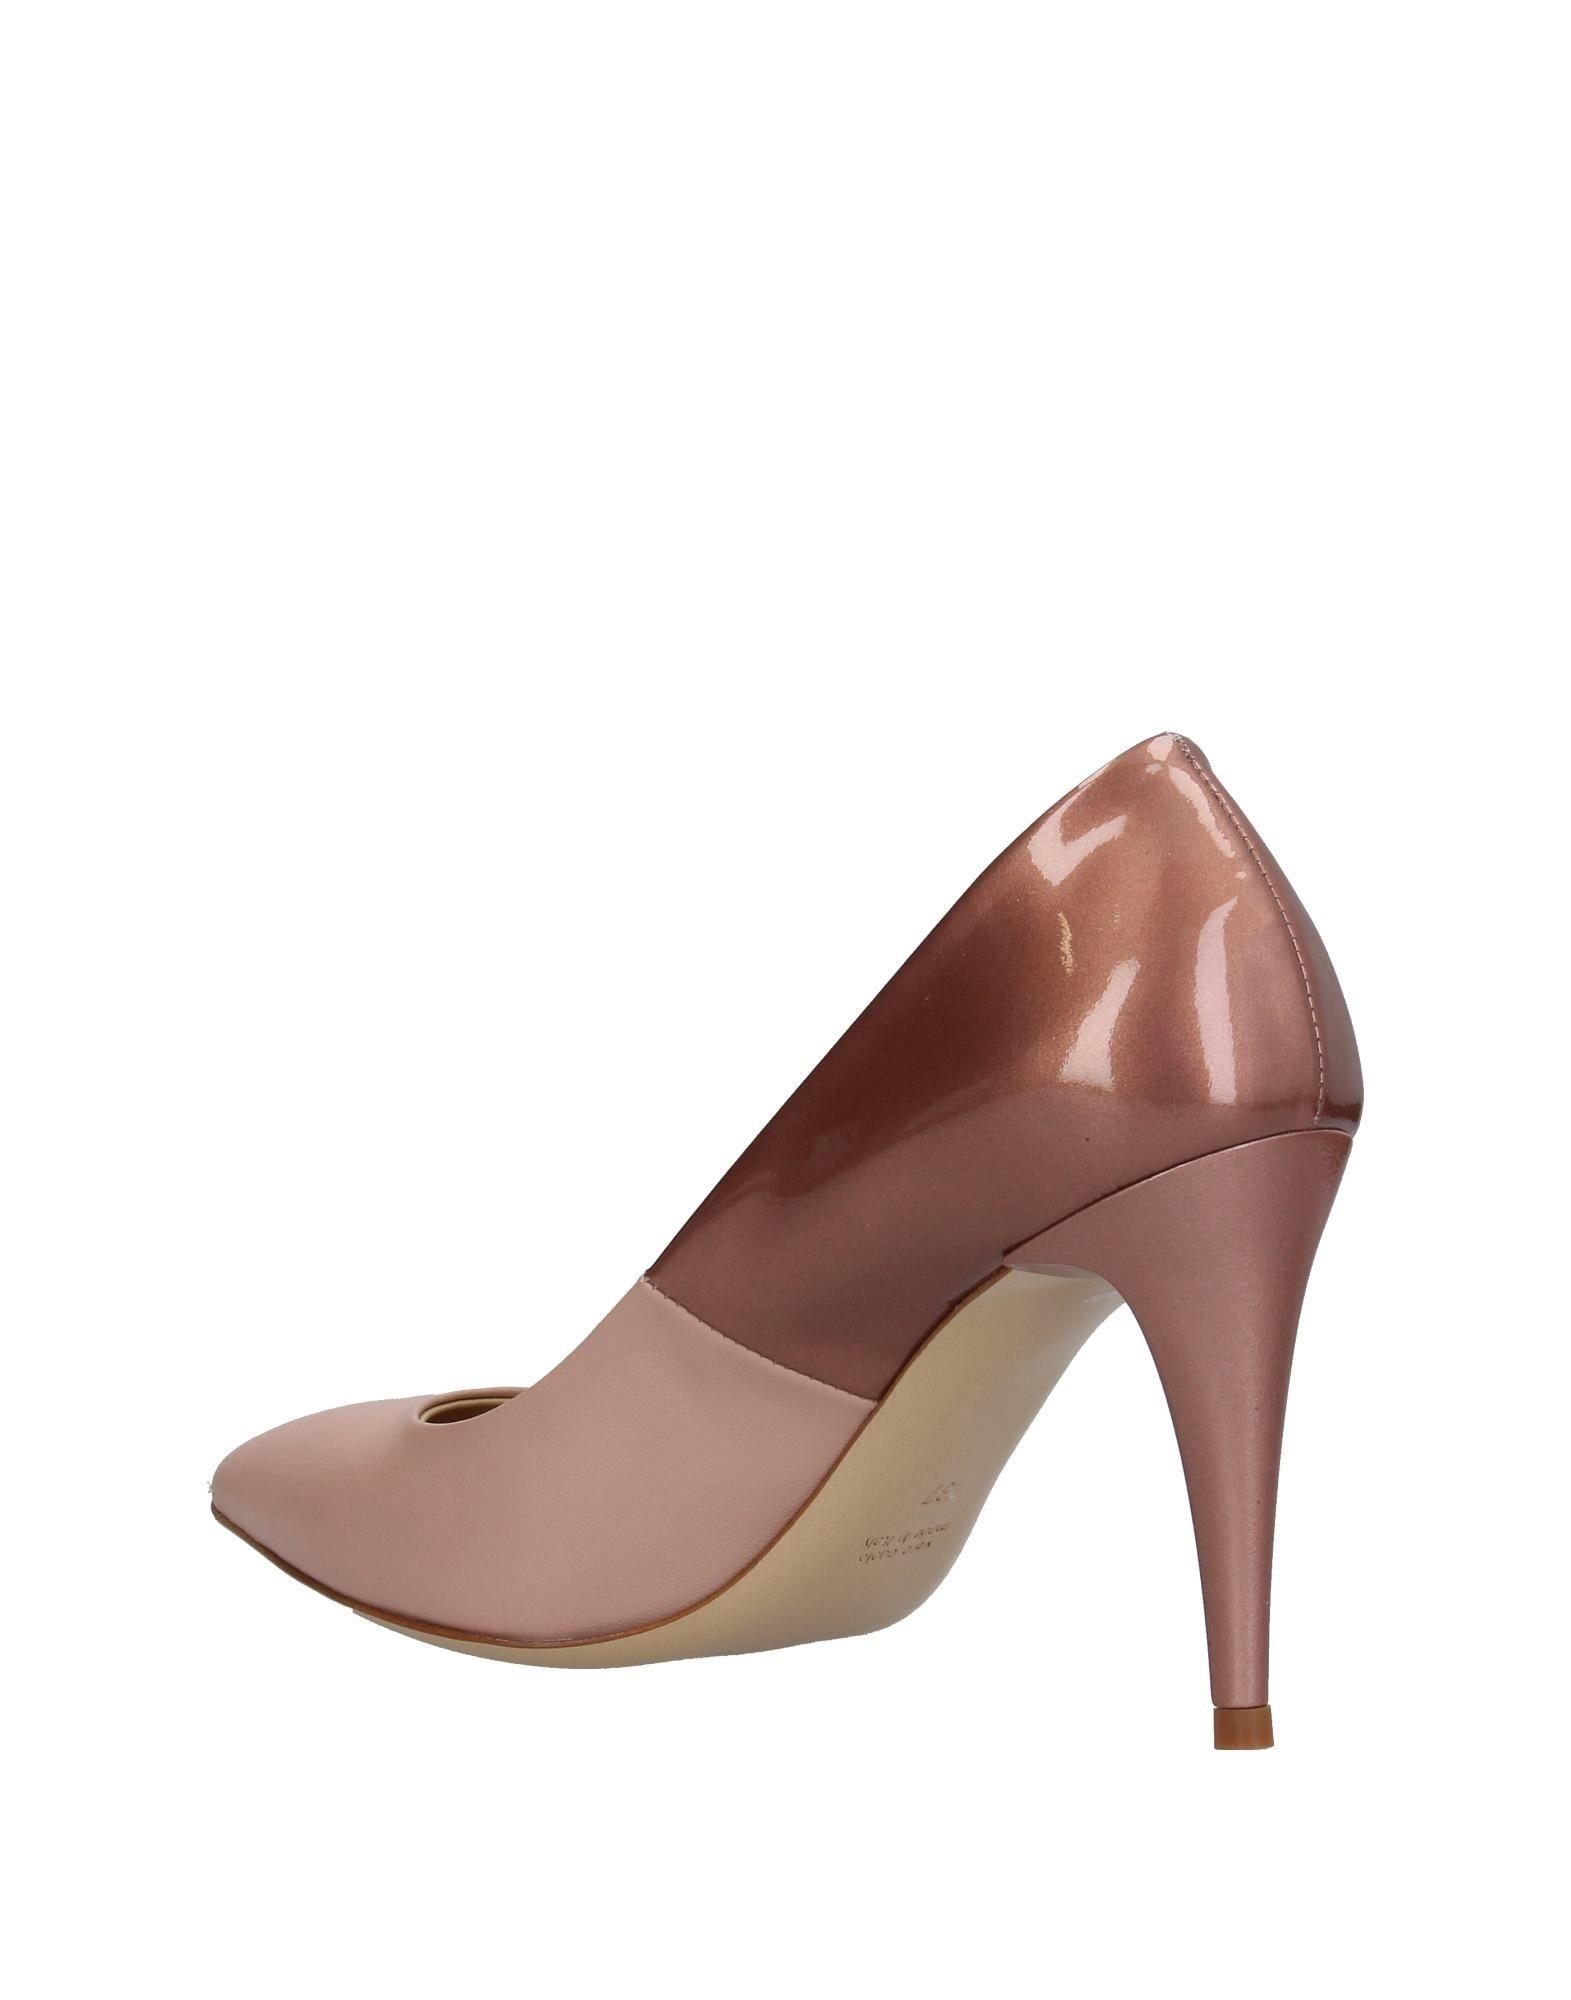 Stele Gute Pumps Damen  11376169JE Gute Stele Qualität beliebte Schuhe def423